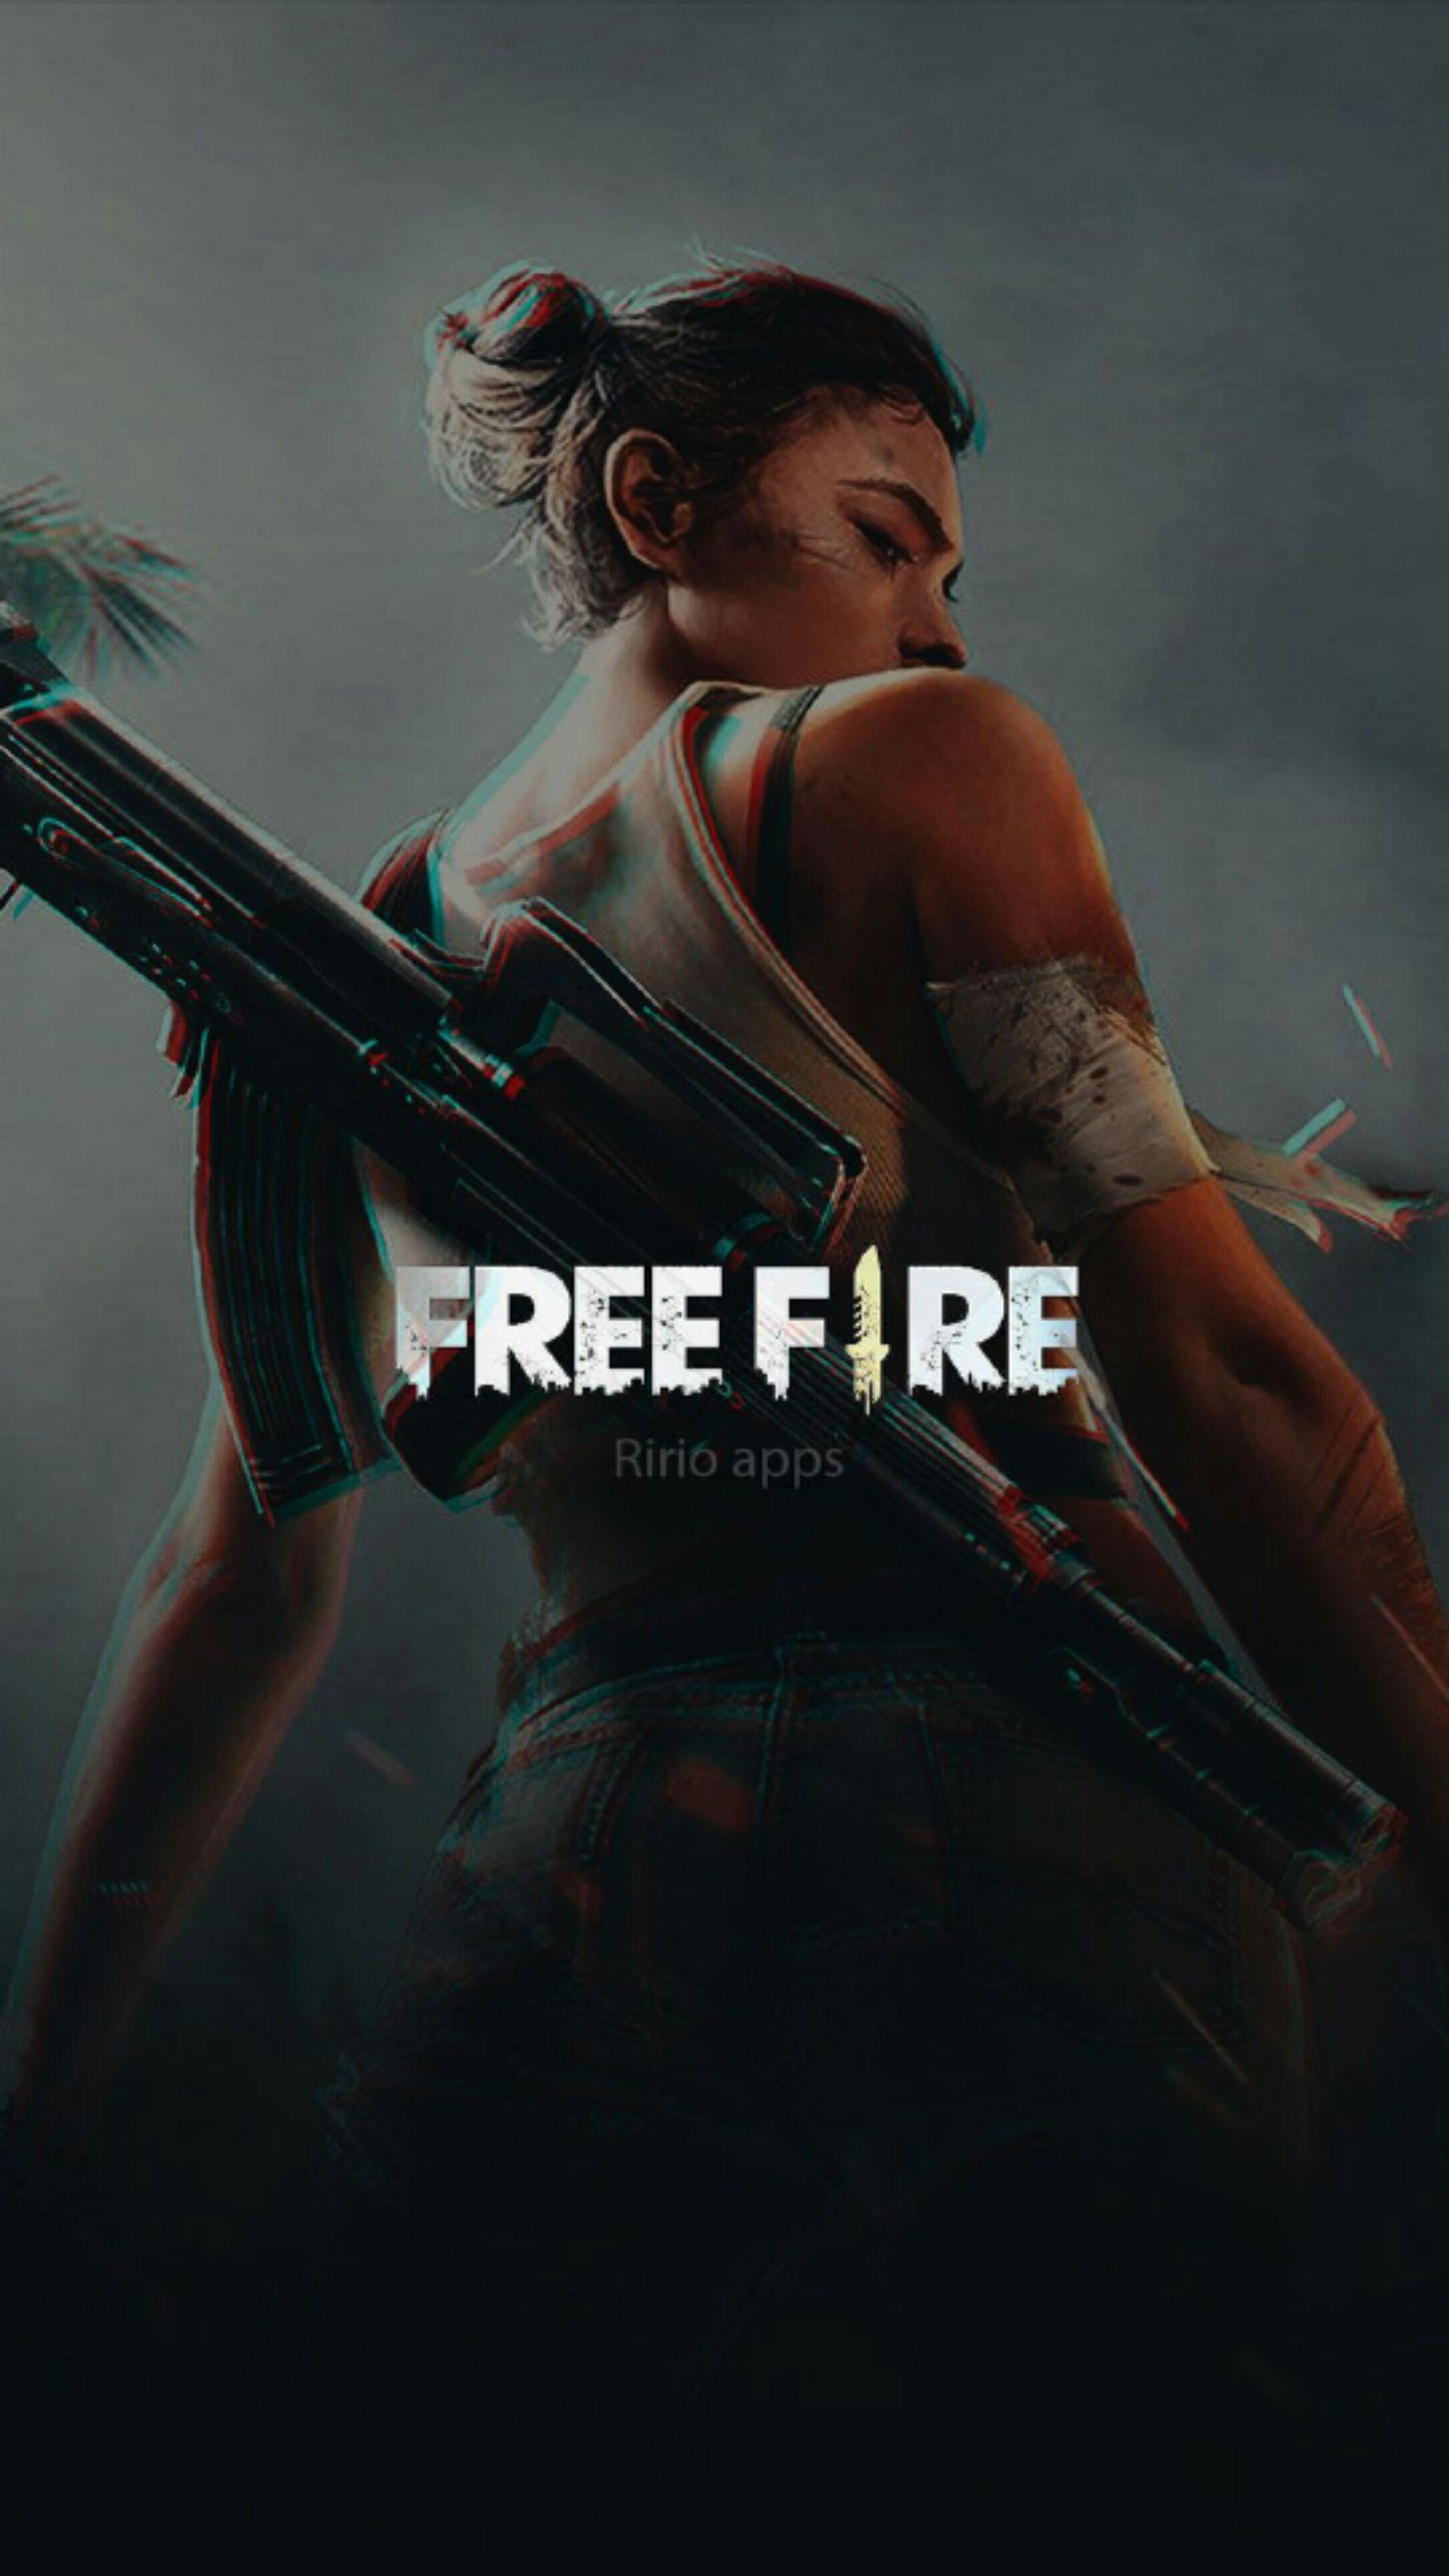 100 Gambar Gambar Keren Free Fire Wallpaper Terlihat Cantik